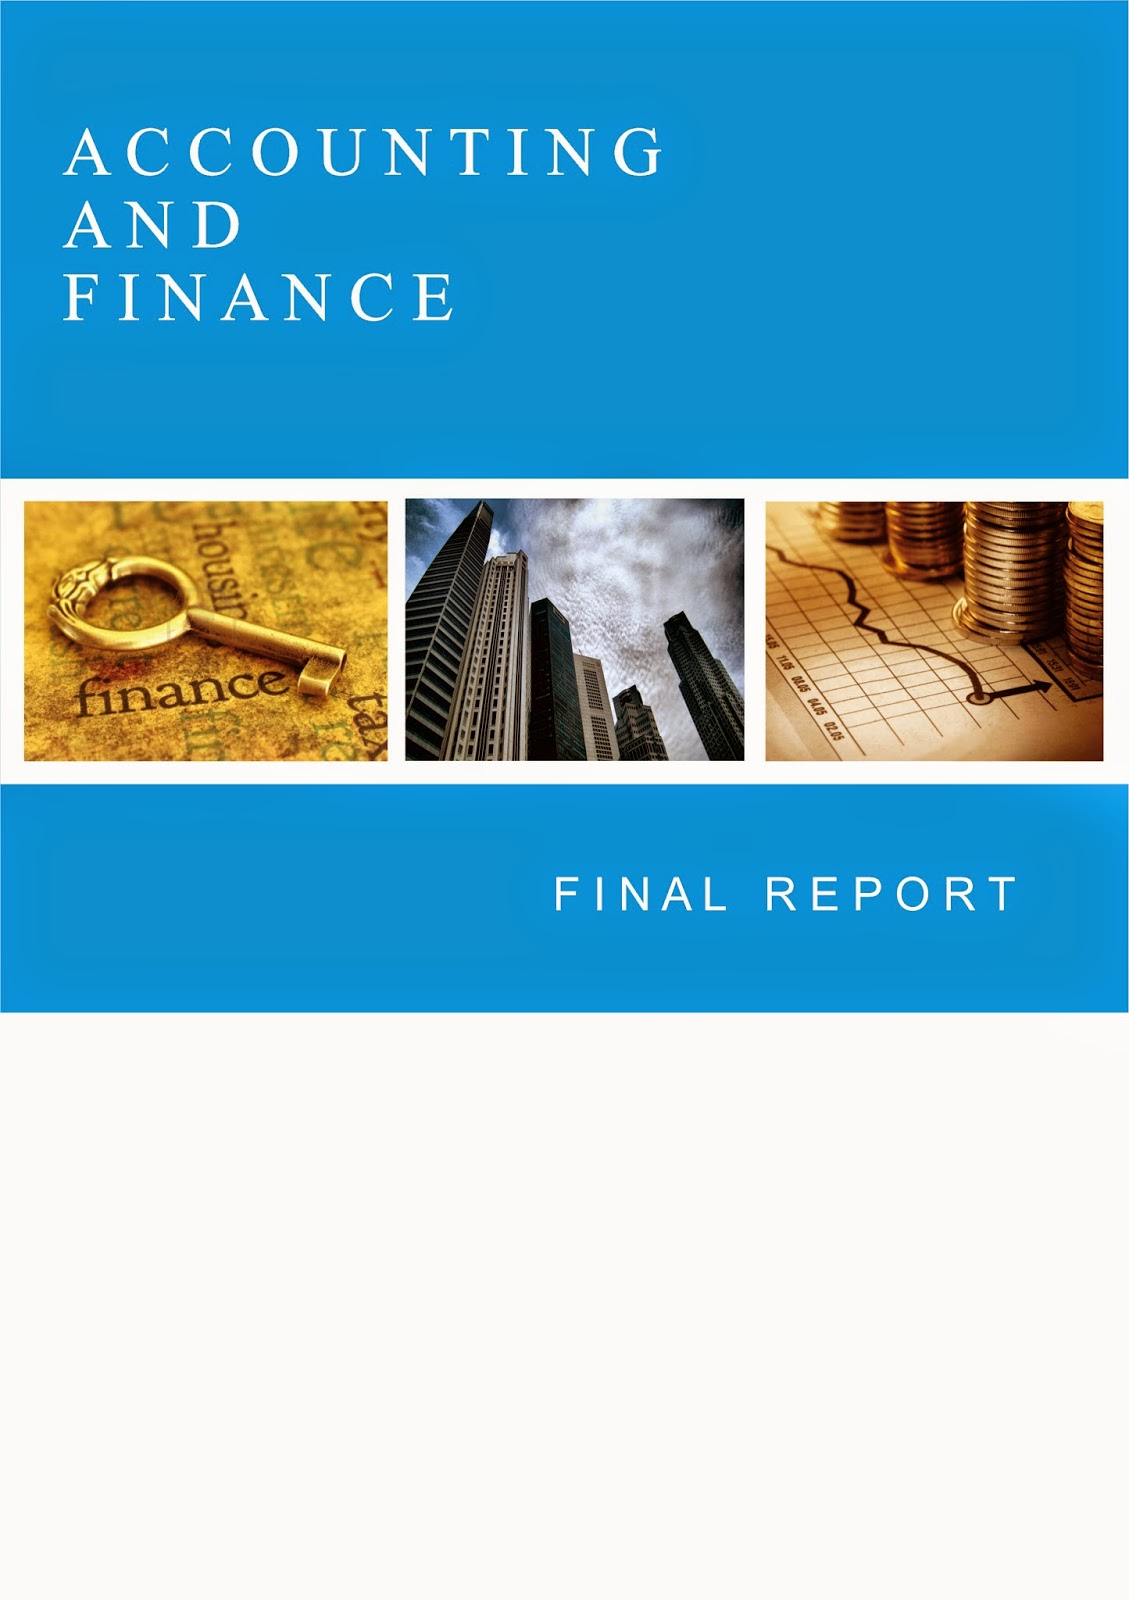 download contoh cover laporan